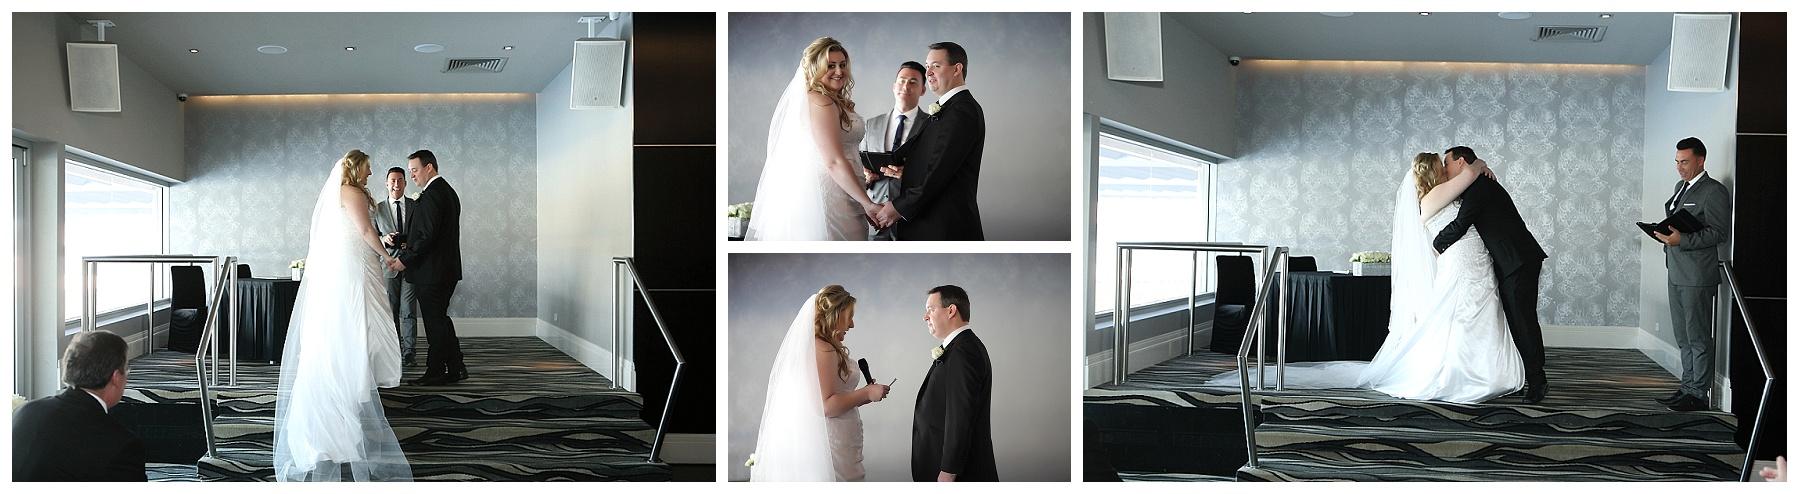 Wedding ceremony at the Breakwater